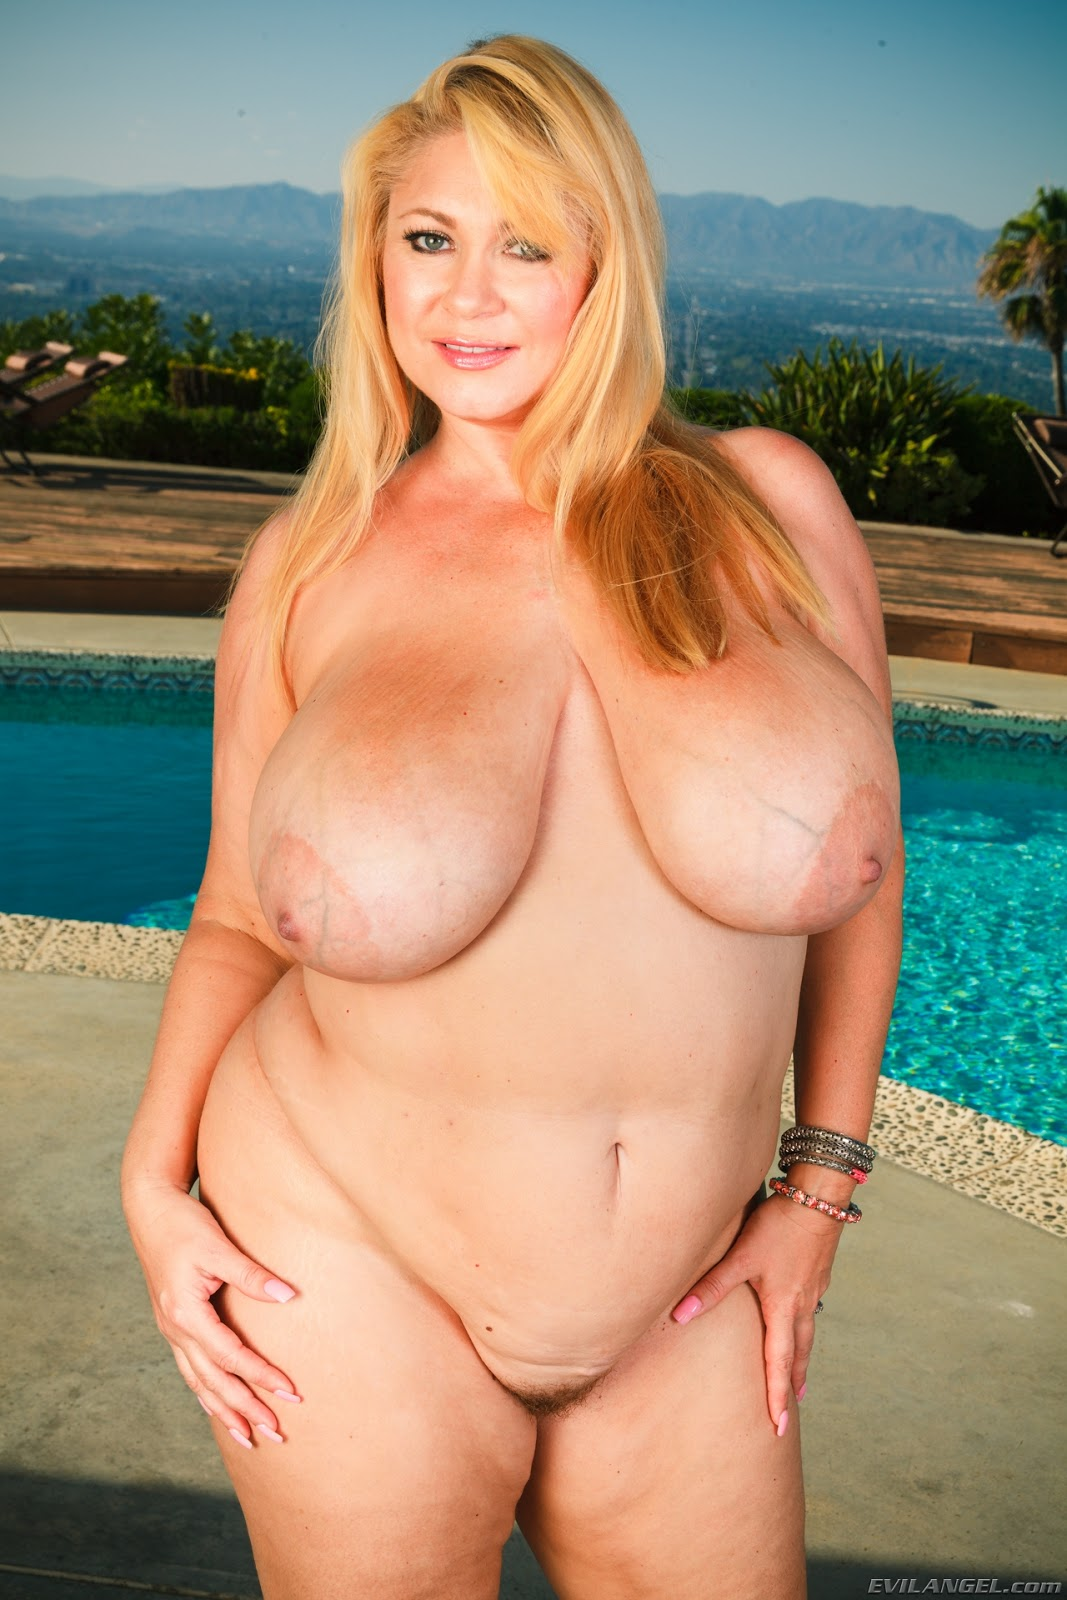 Samantha anderson nude